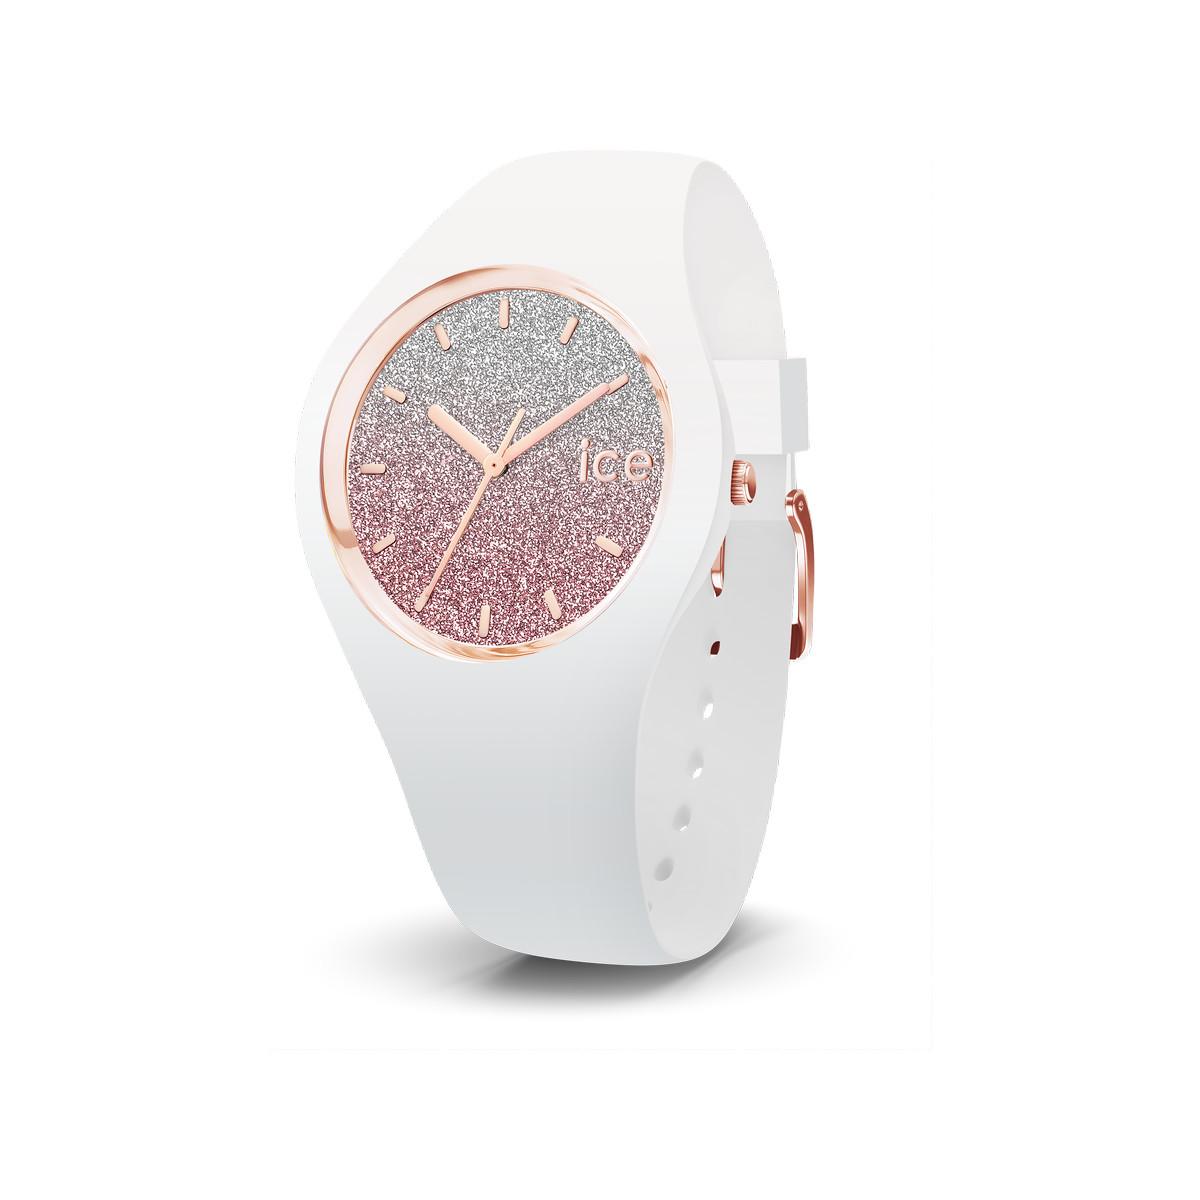 Montre Ice Watch Femme Silicone Blanc Femme Modele 013431 Maty